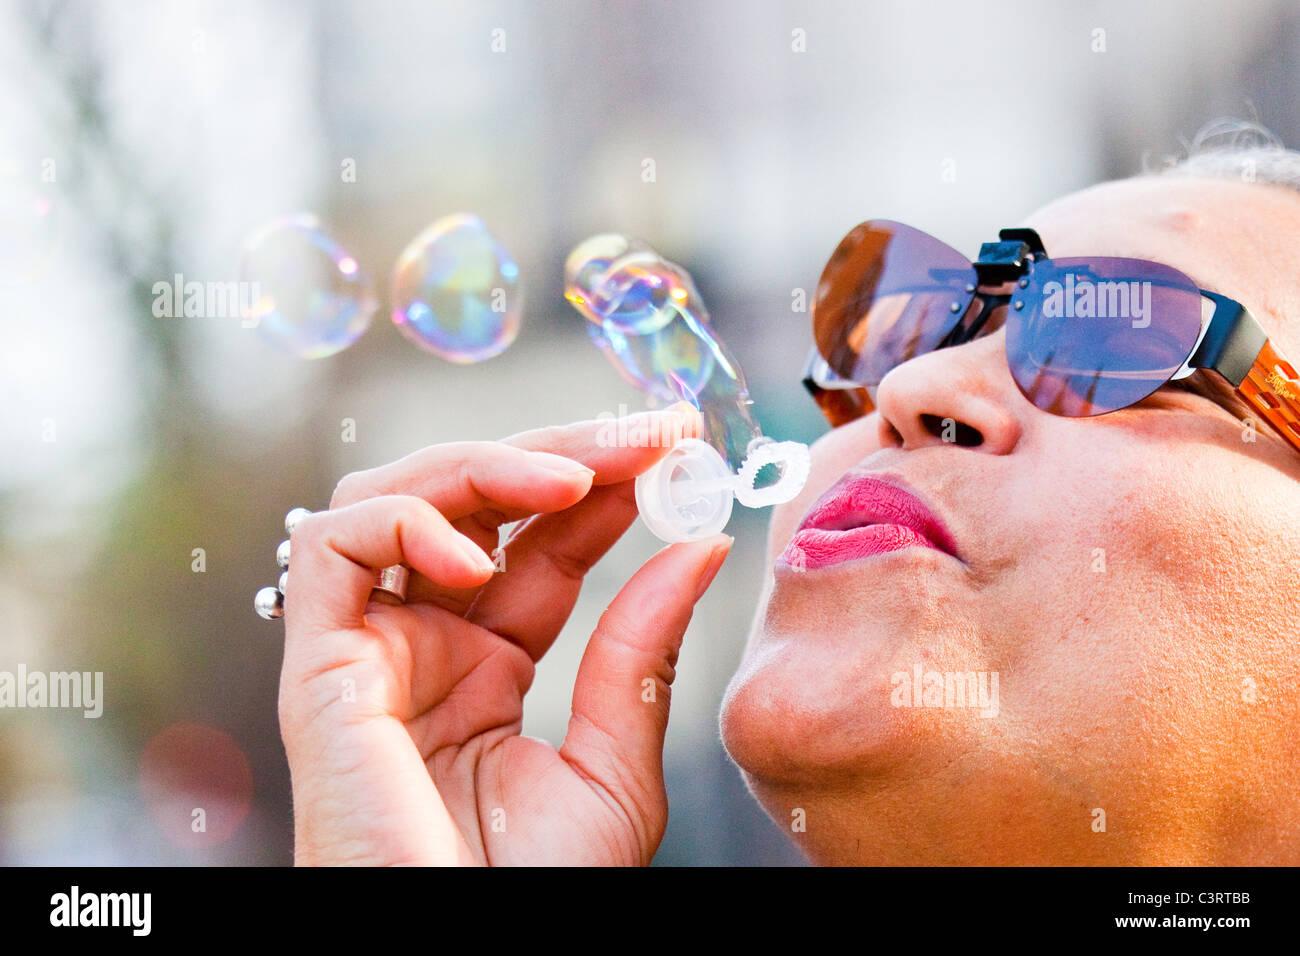 Frau bläst Seifenblasen in Washington, D.C. Stockbild